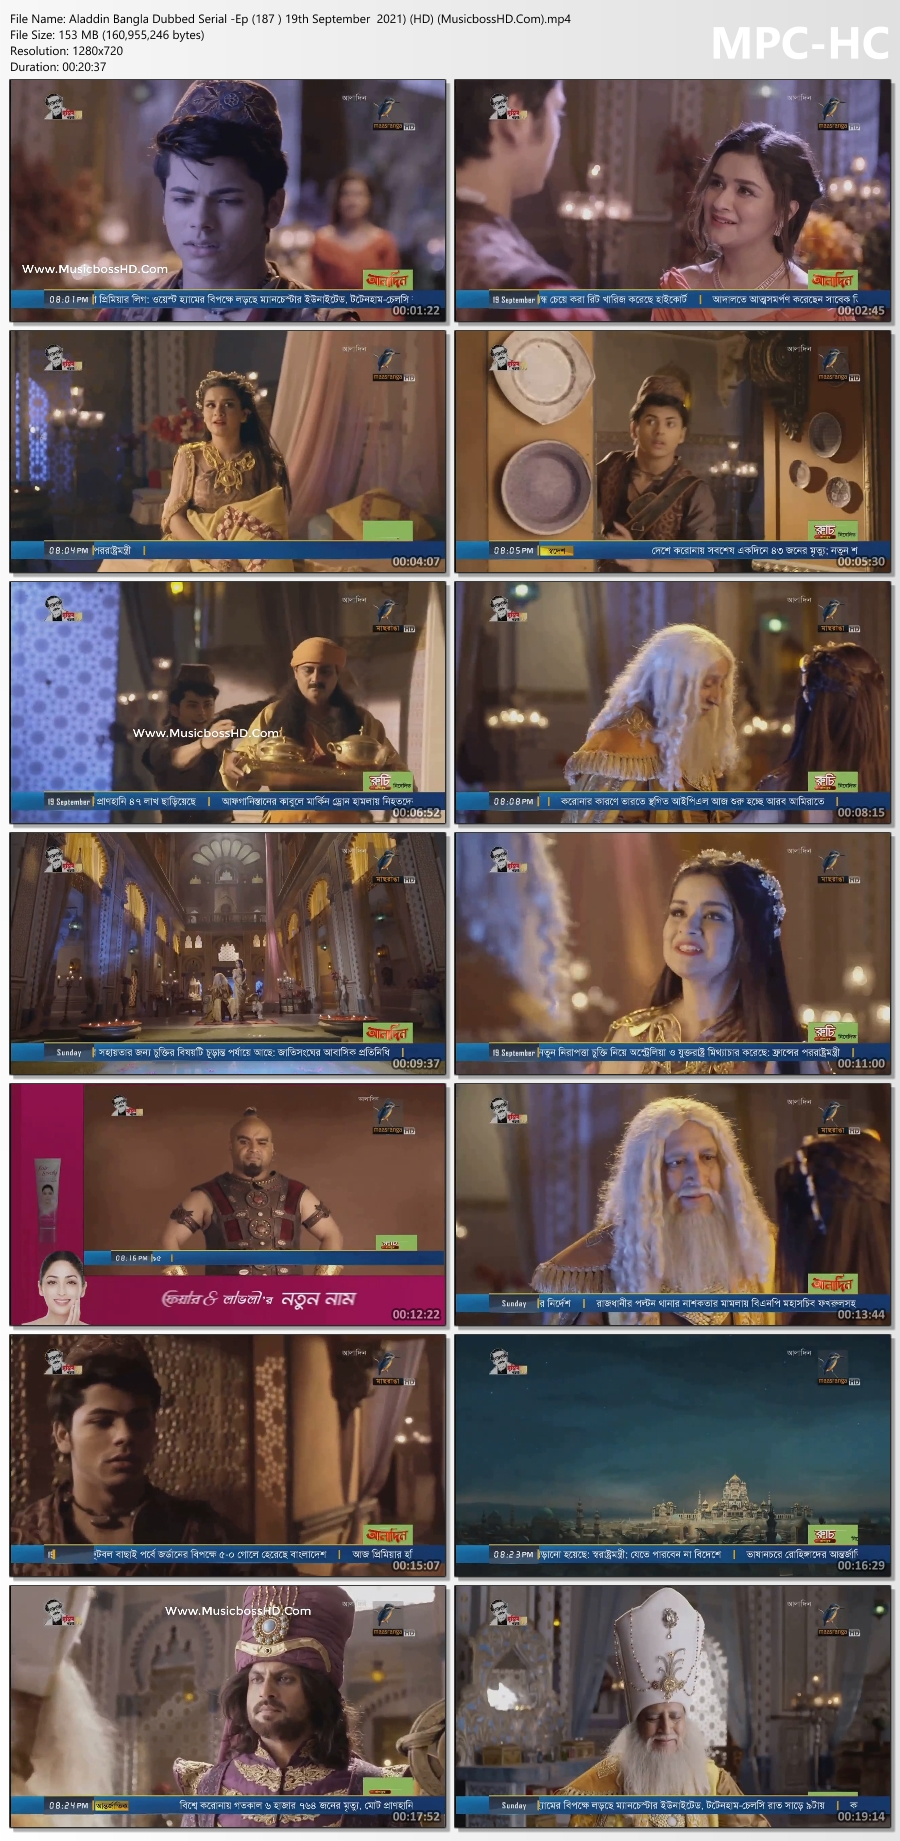 Aladdin-Bangla-Dubbed-Serial-Ep-187-19th-September-2021-HD-Musicboss-HD-Com-mp4-thumbs